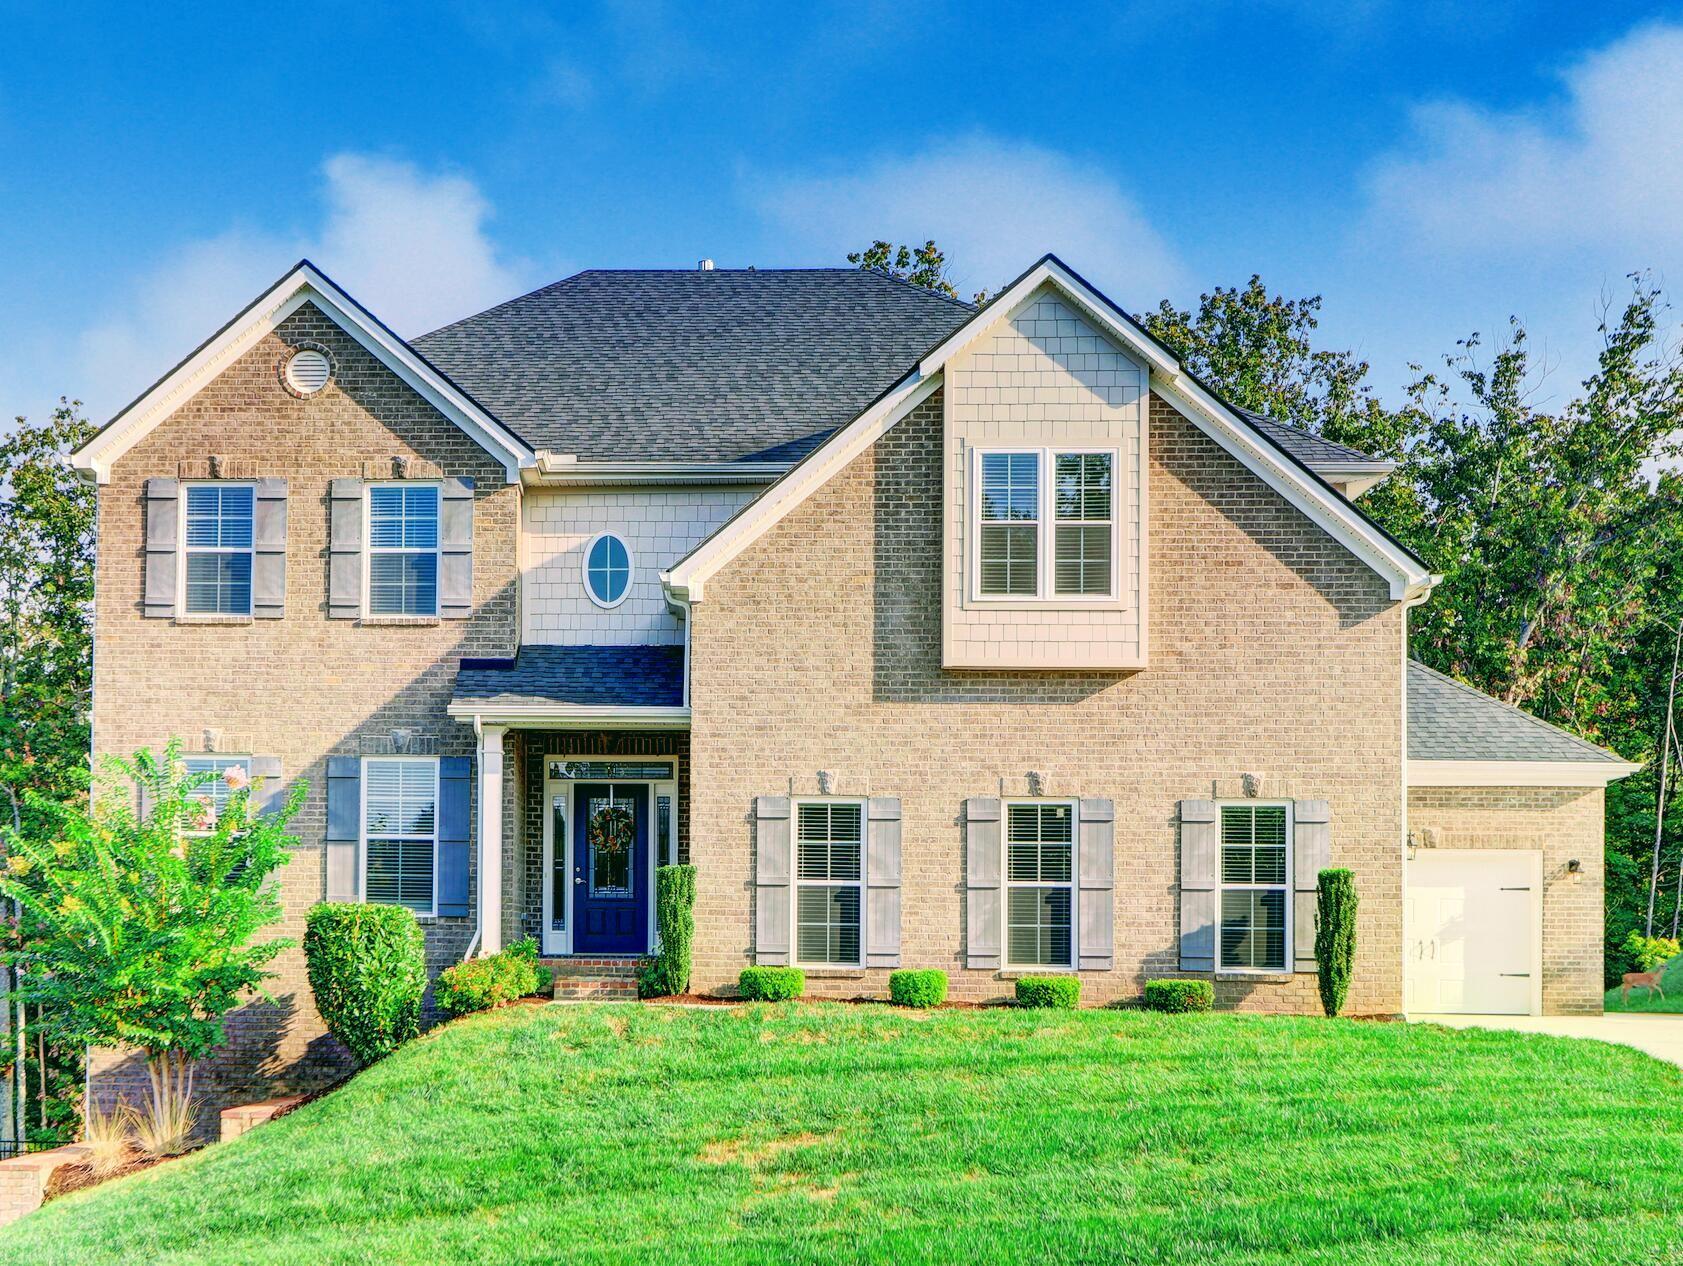 Photo of 2132 Mystic Ridge Rd, Knoxville, TN 37922 (MLS # 1167812)